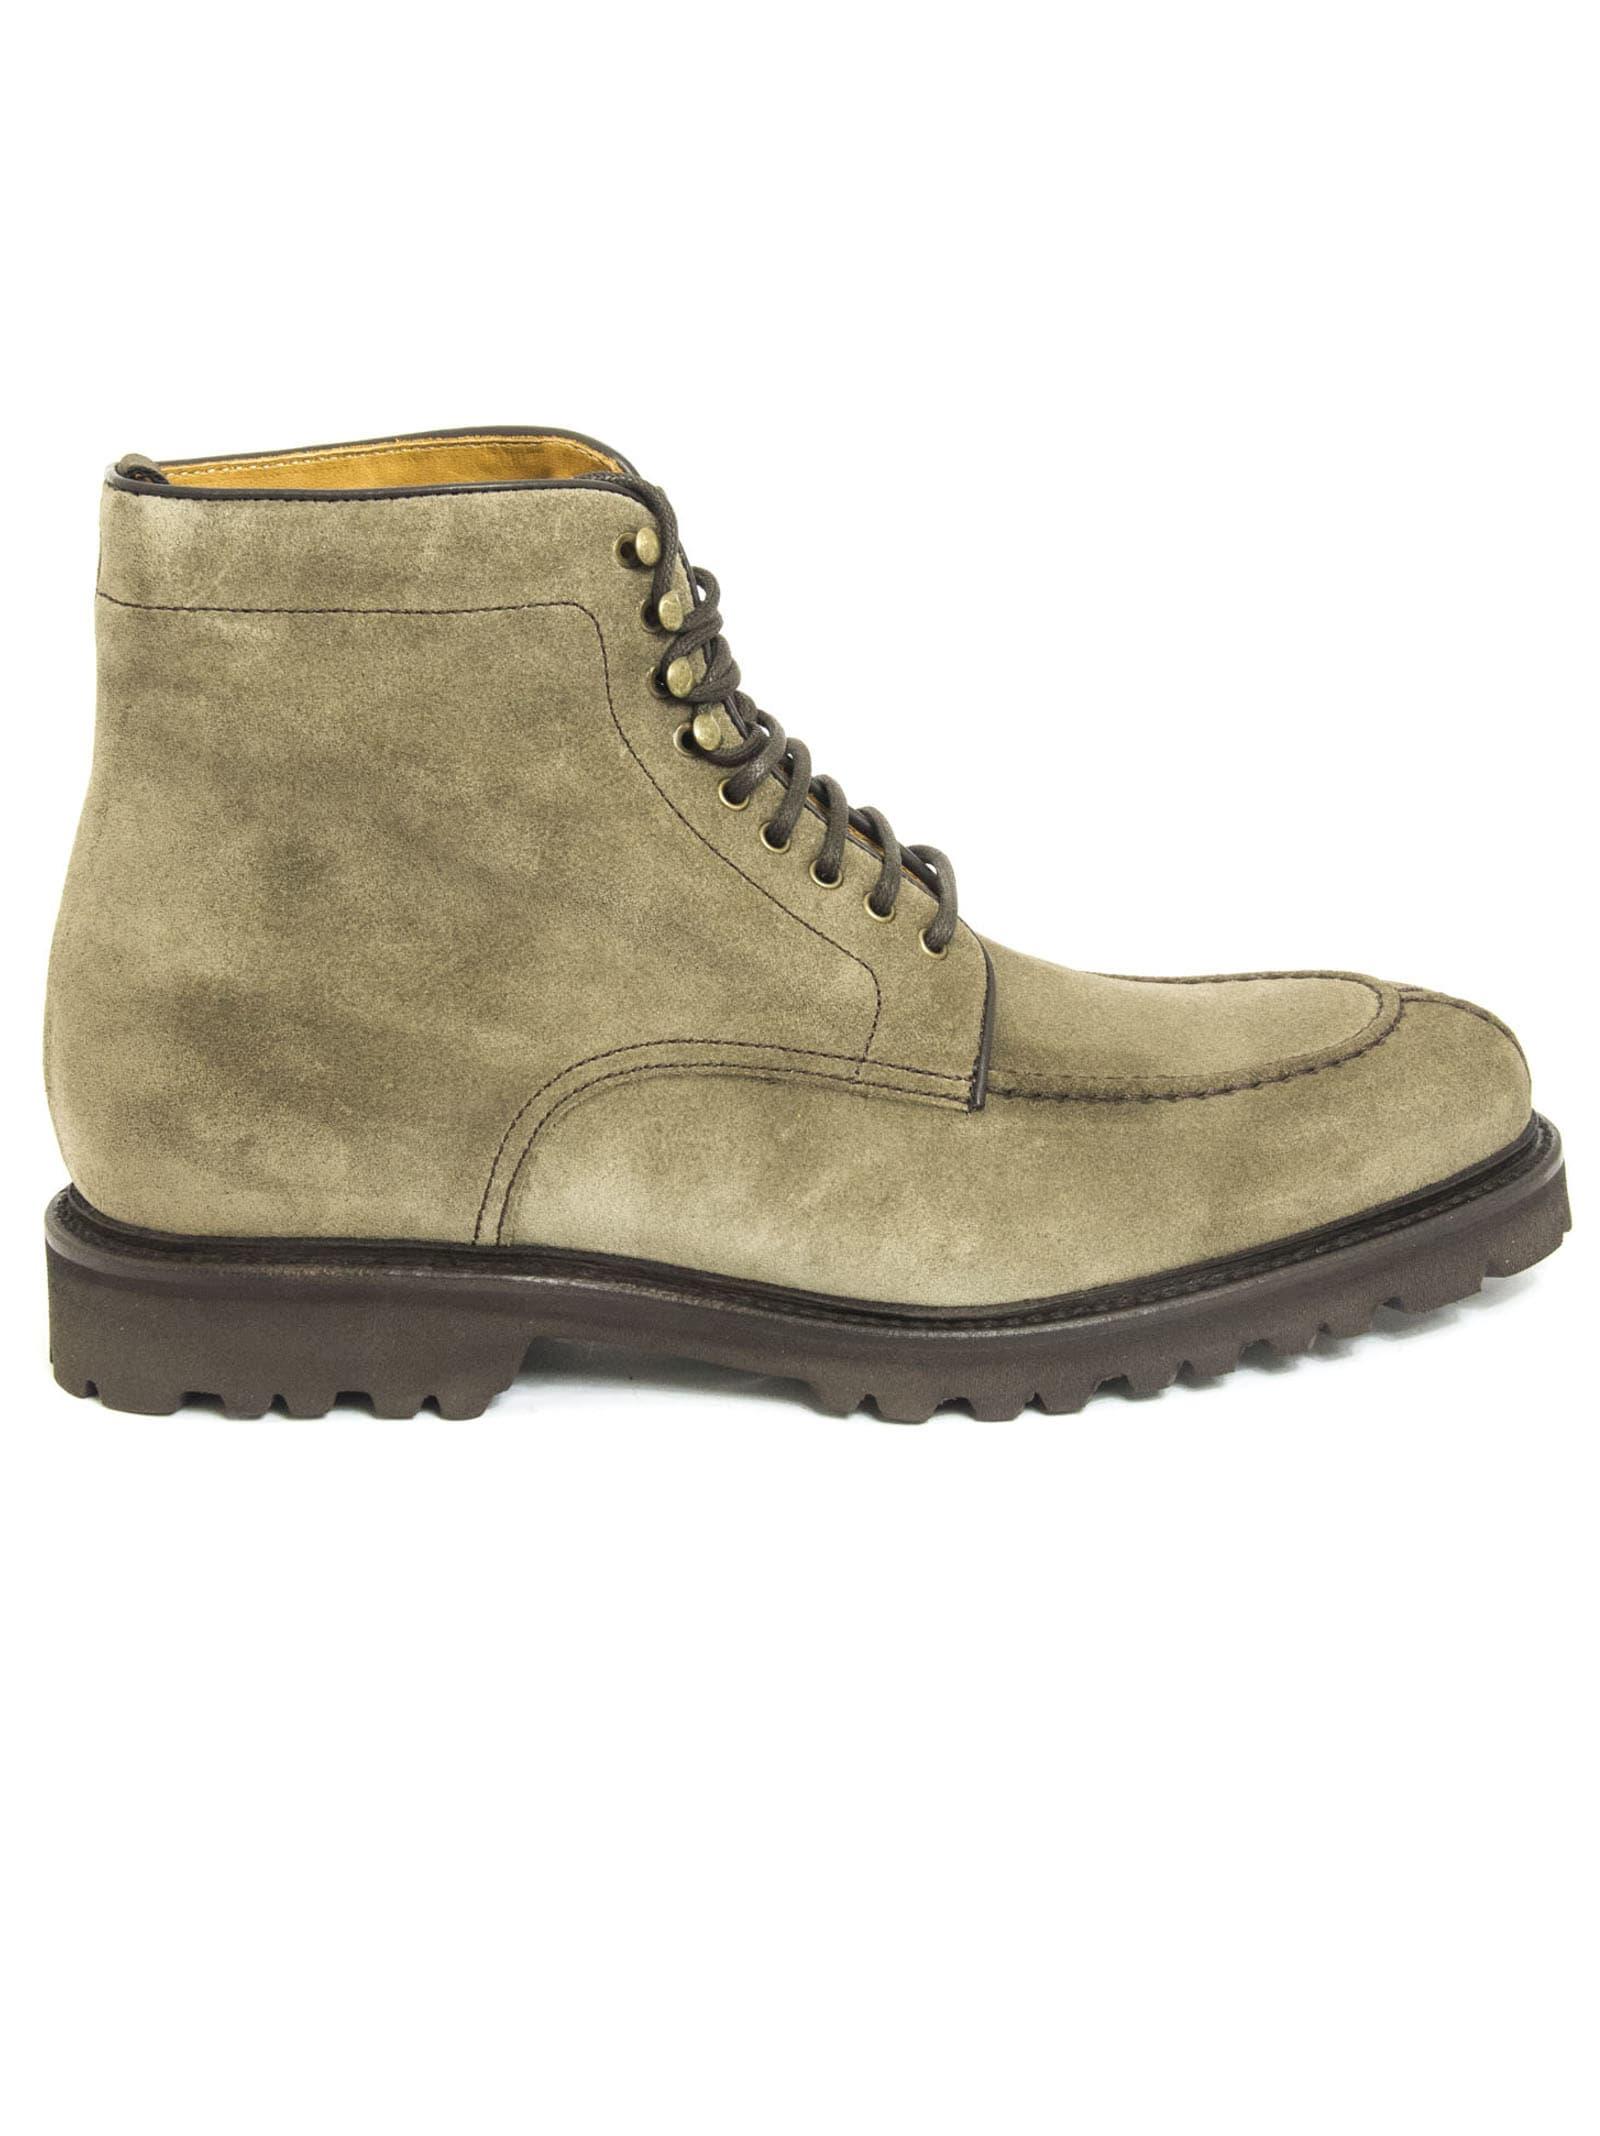 Berwick 1707 Mud-tone Leather Boots